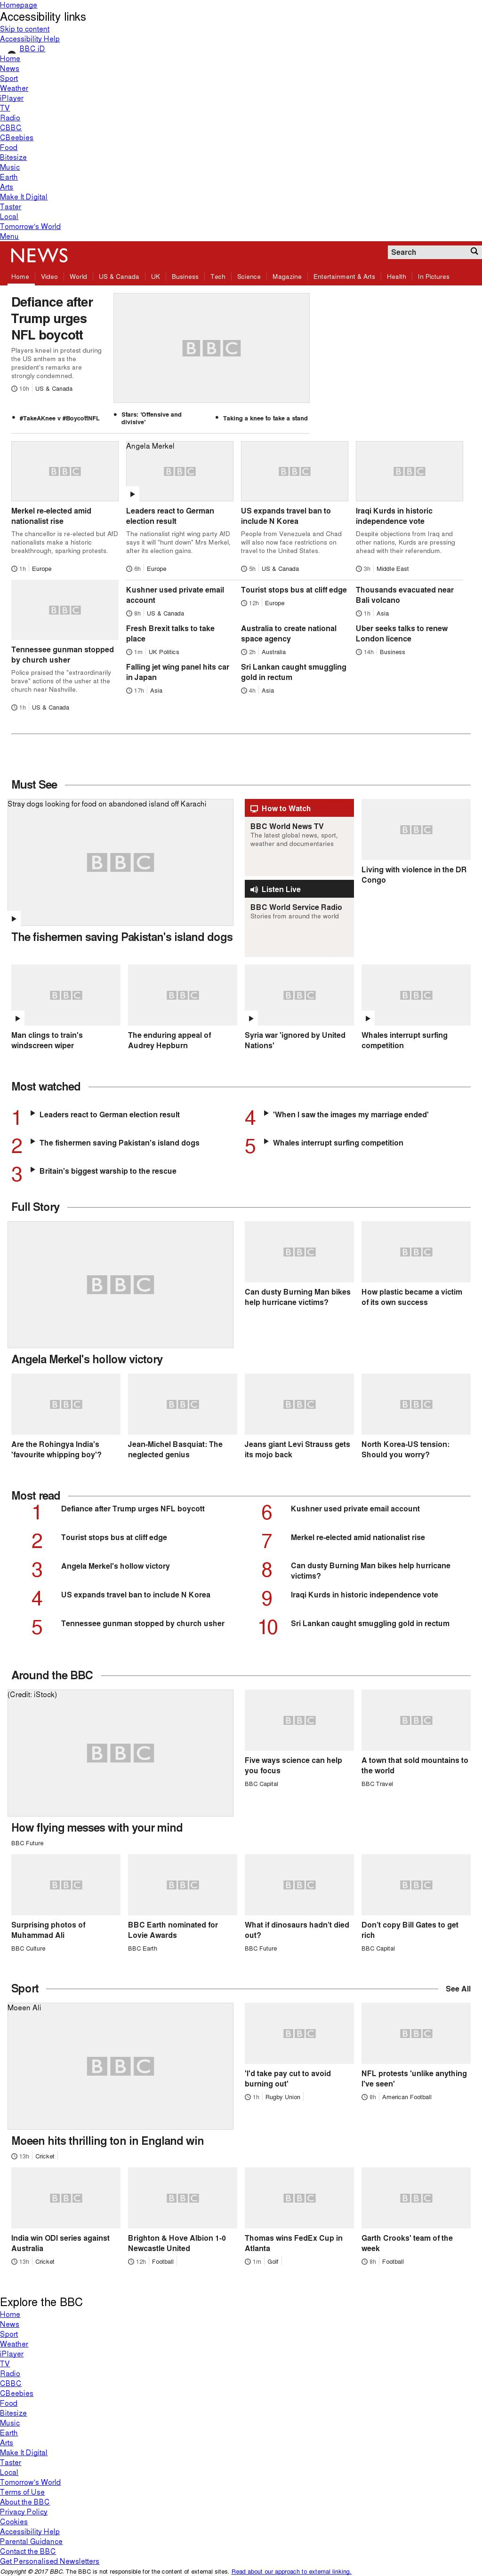 BBC at Monday Sept. 25, 2017, 8 a.m. UTC